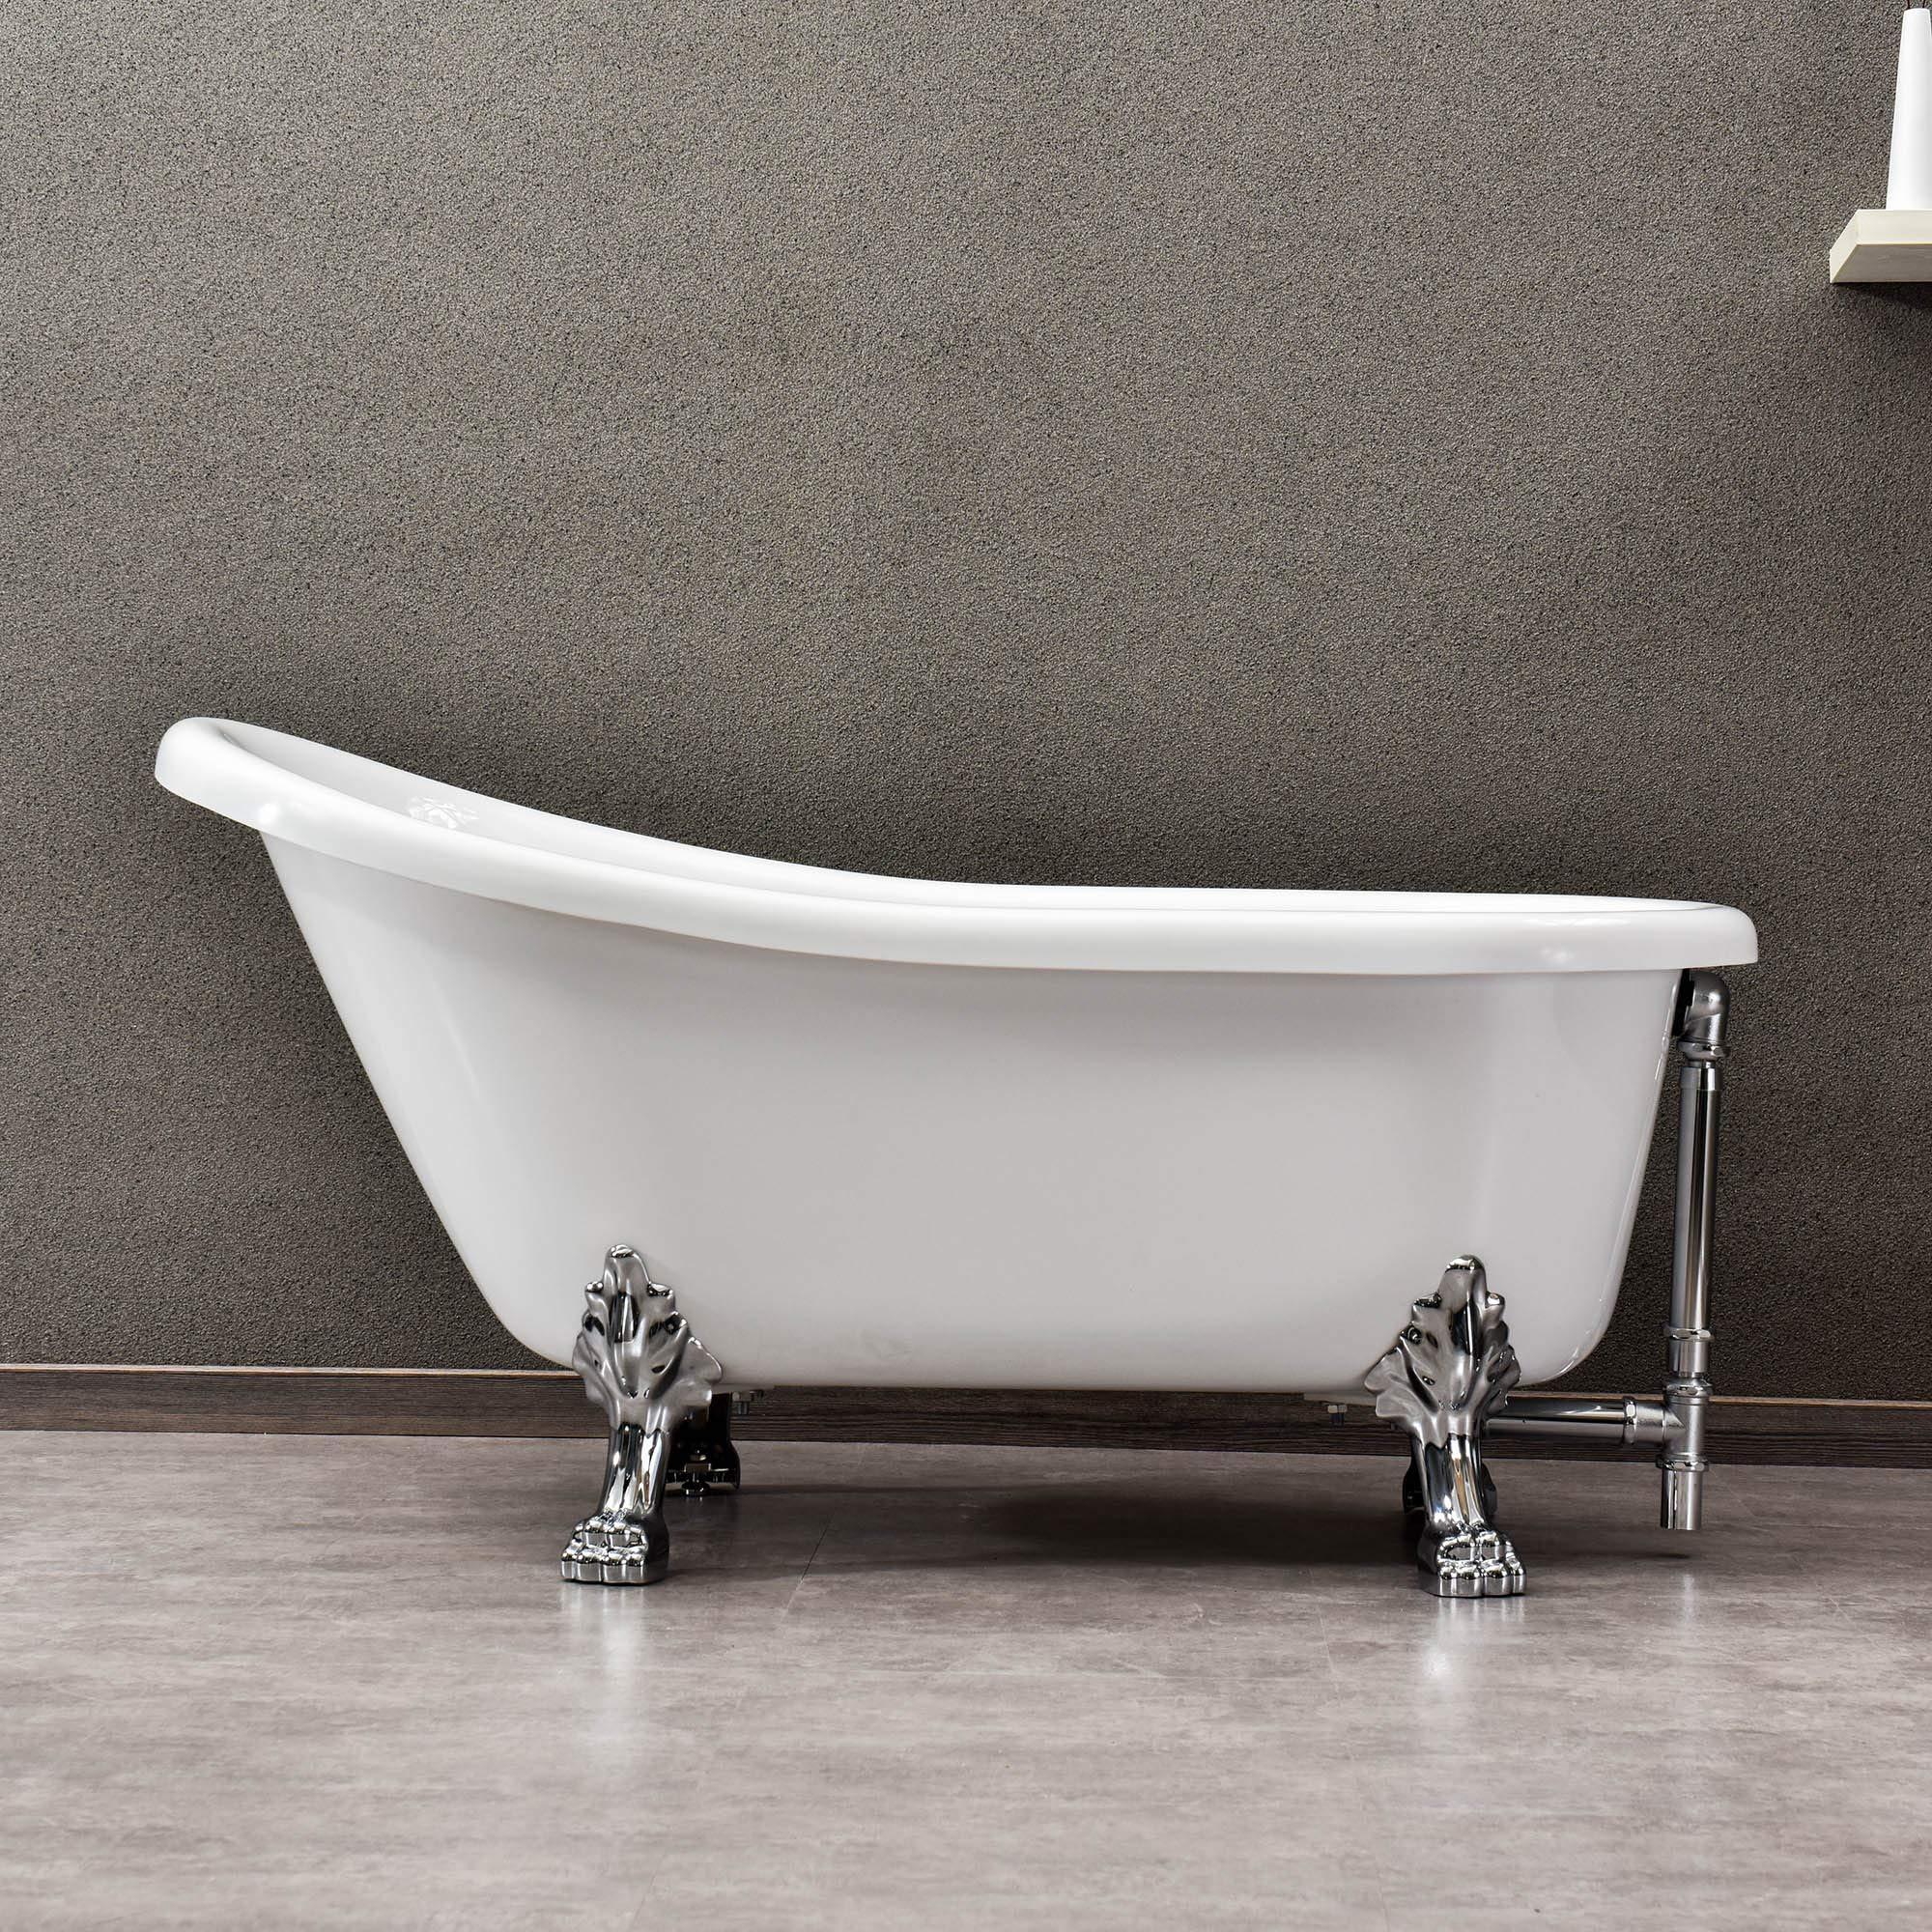 WOODBRIDGE Slipper Clawfoot Bathtub with solid brass Polished Chrome Finish drain and overflow, B-0022 /BTA1522 Tub 59''